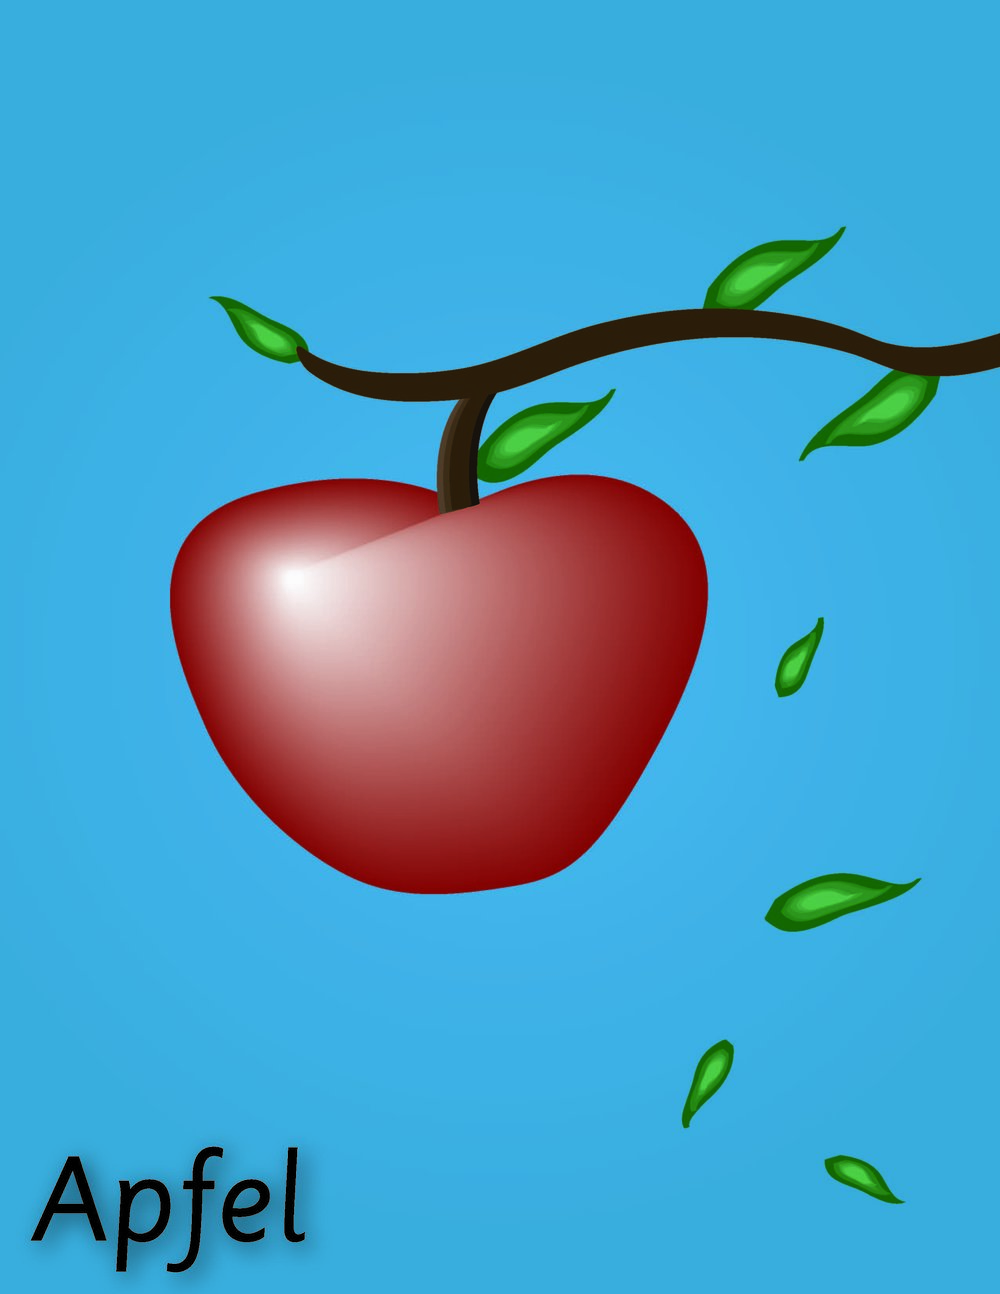 apple 2b copy.jpg